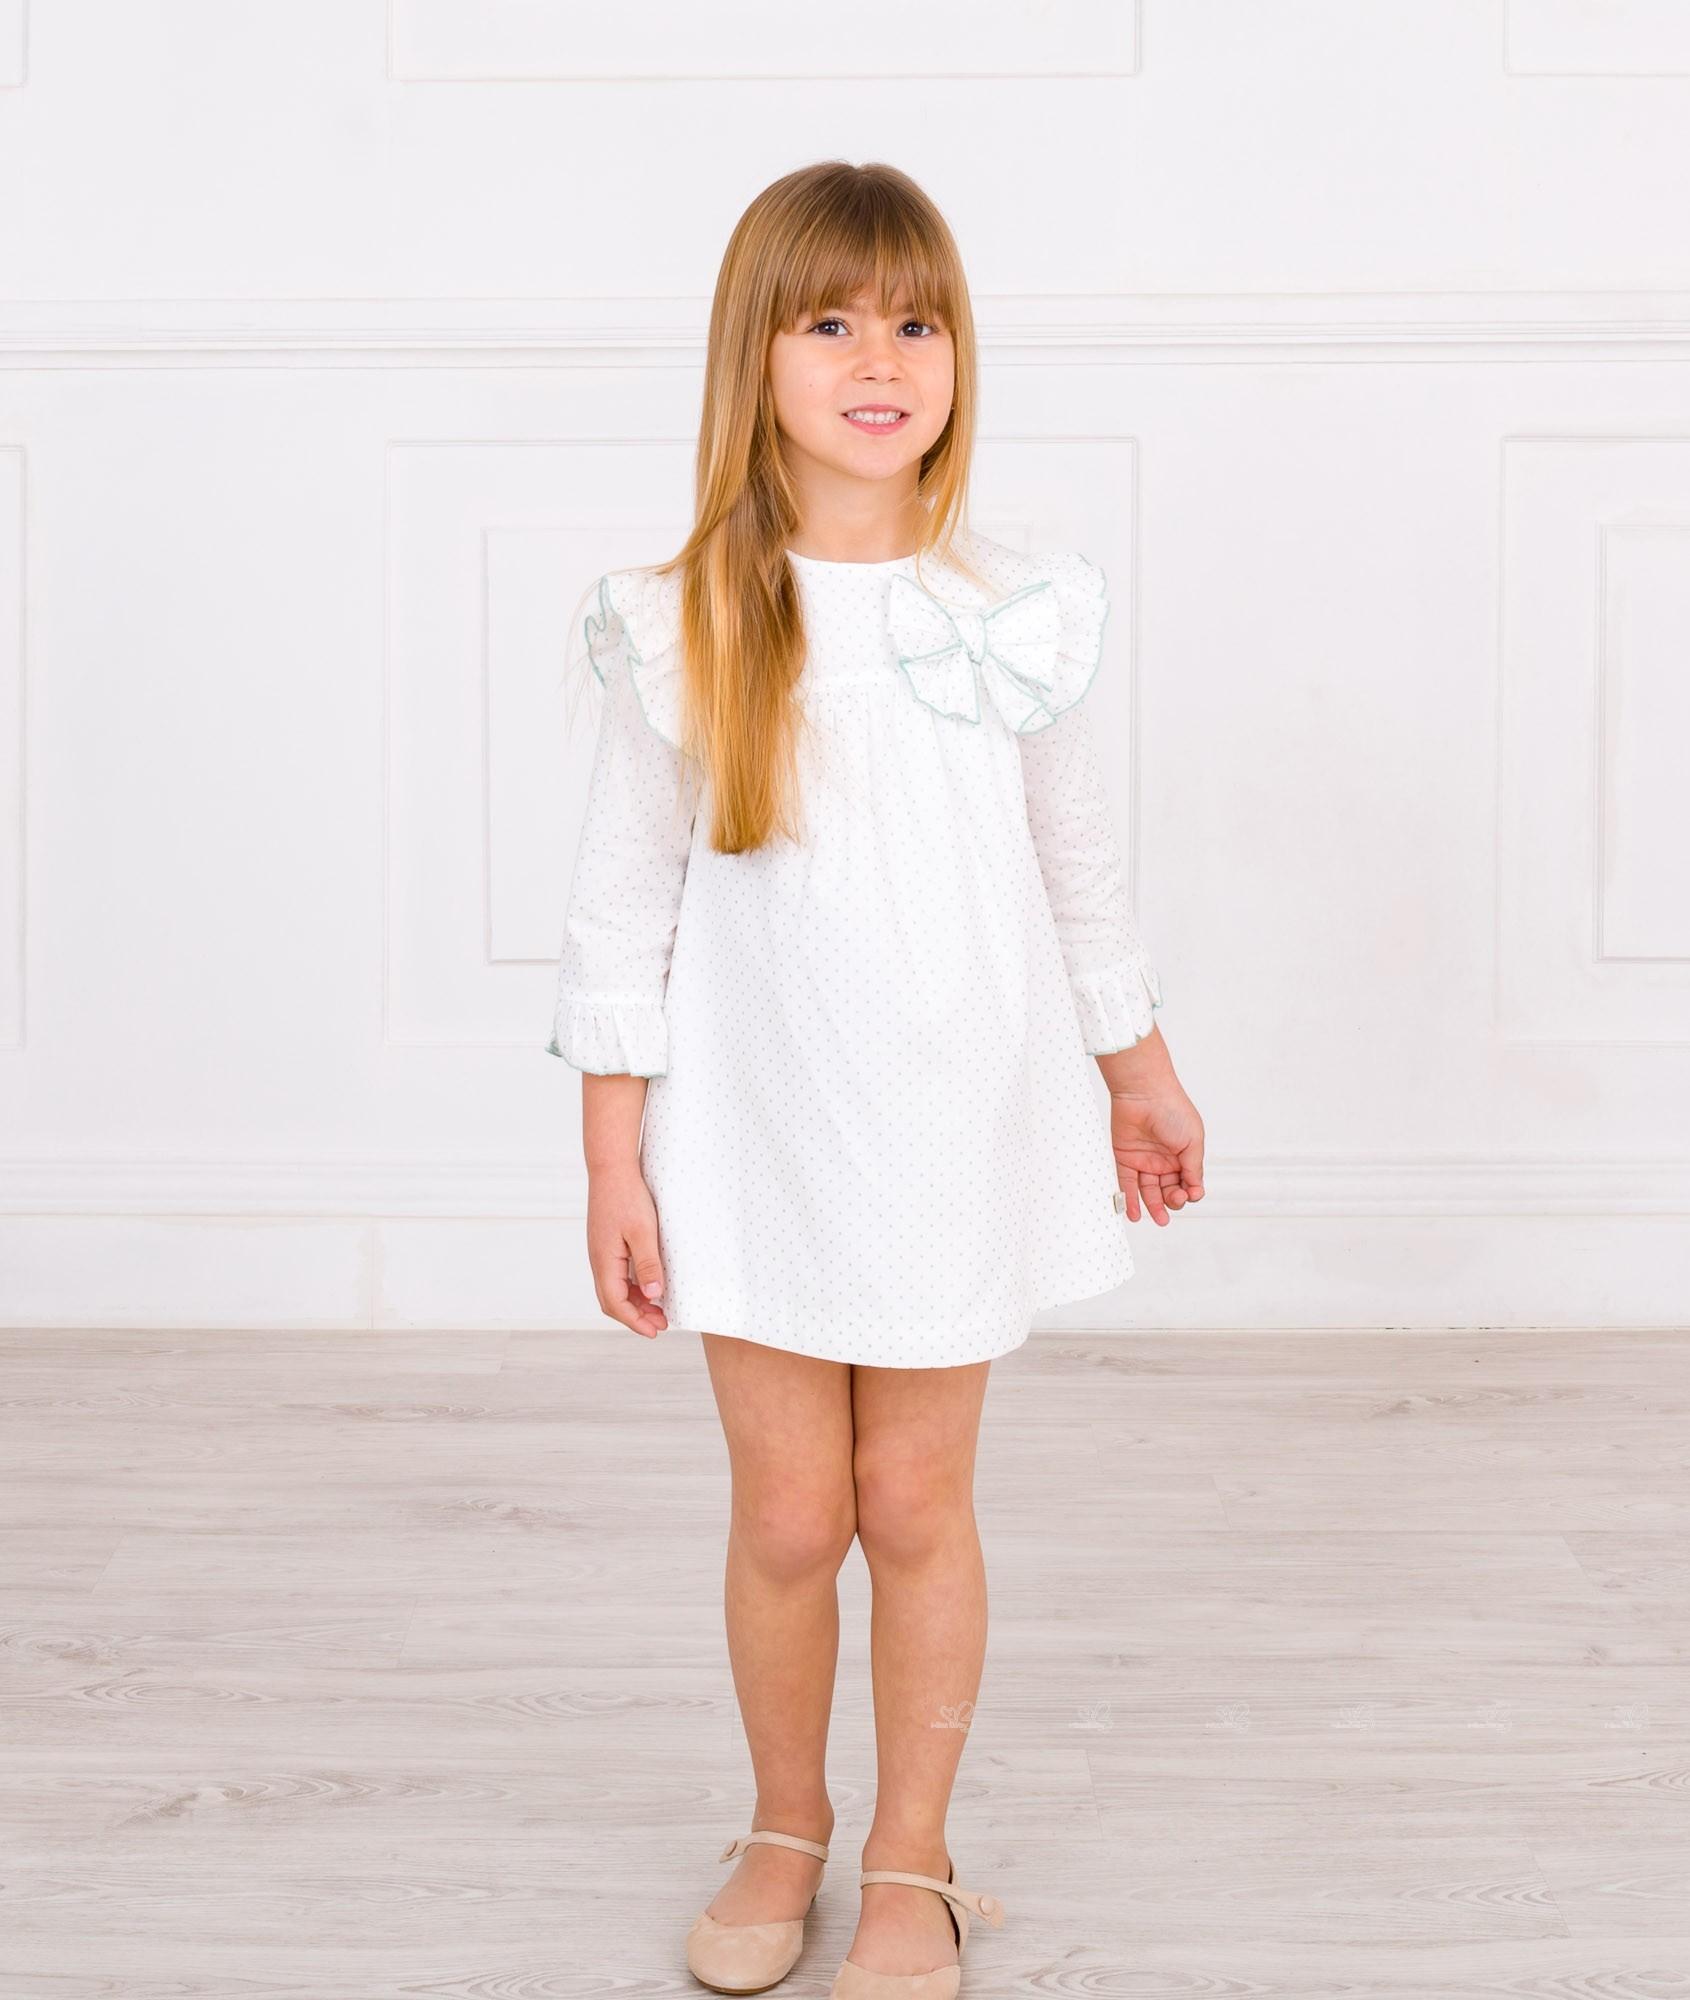 84de48cef ... Outfit Vestido Manga Francesa Topitos Glitter Verde   Blanco